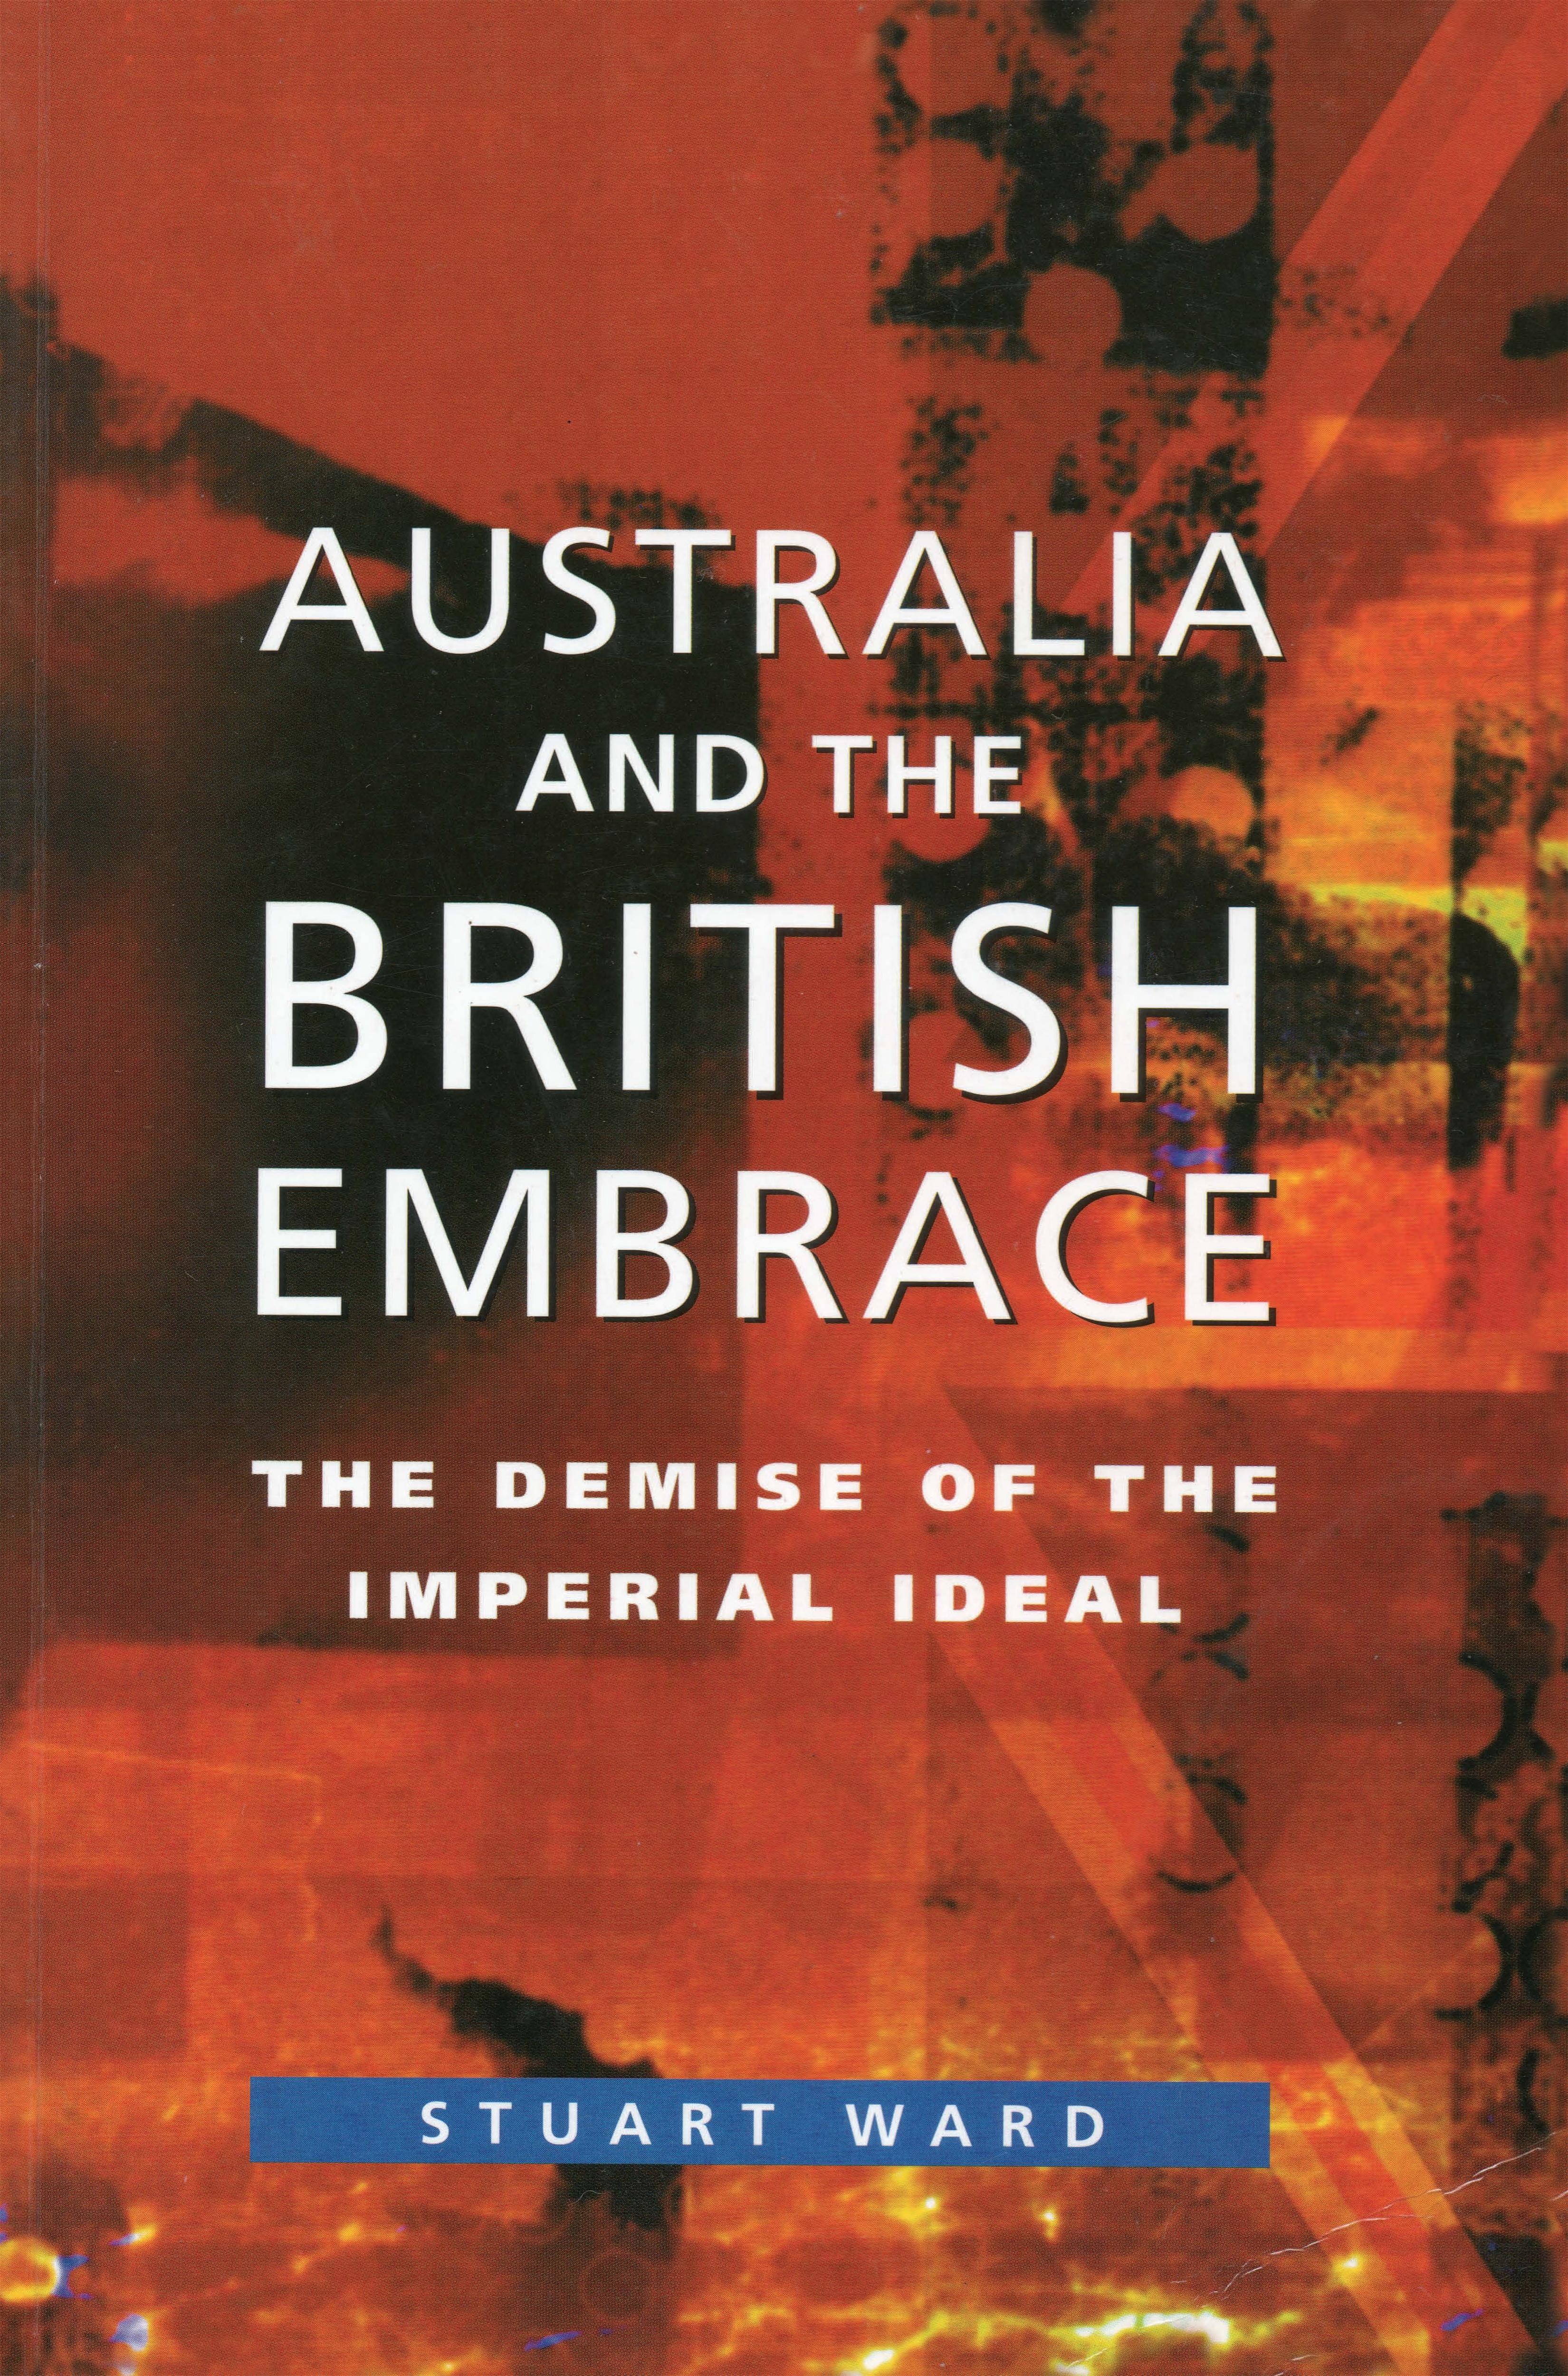 Australia And The British Embrace, Stuart Ward